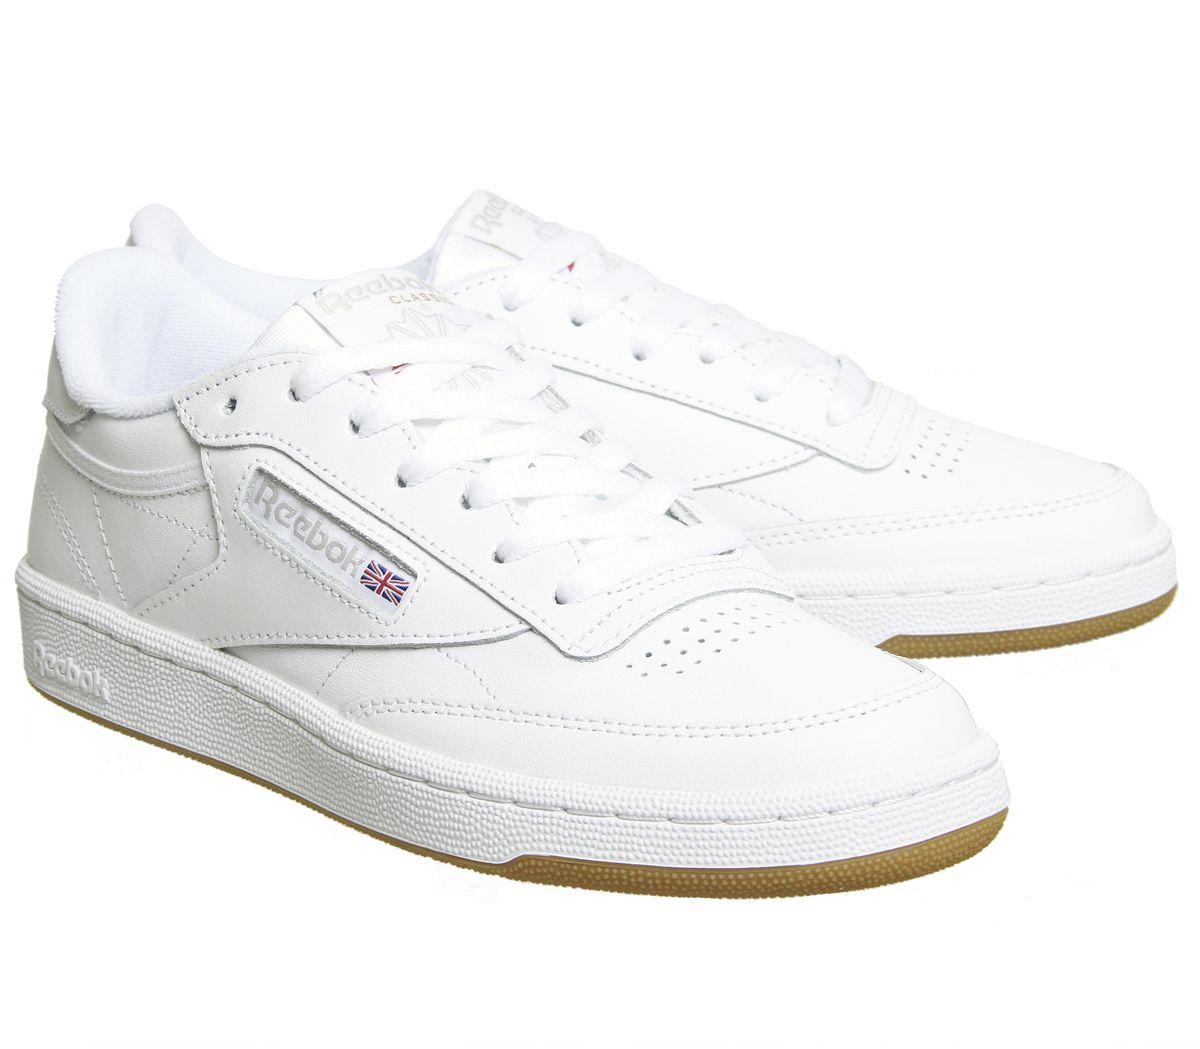 Haut-femme-Reebok-Club-C-85-Baskets-Gris-Blanc-Gomme-Baskets-Chaussures miniature 8